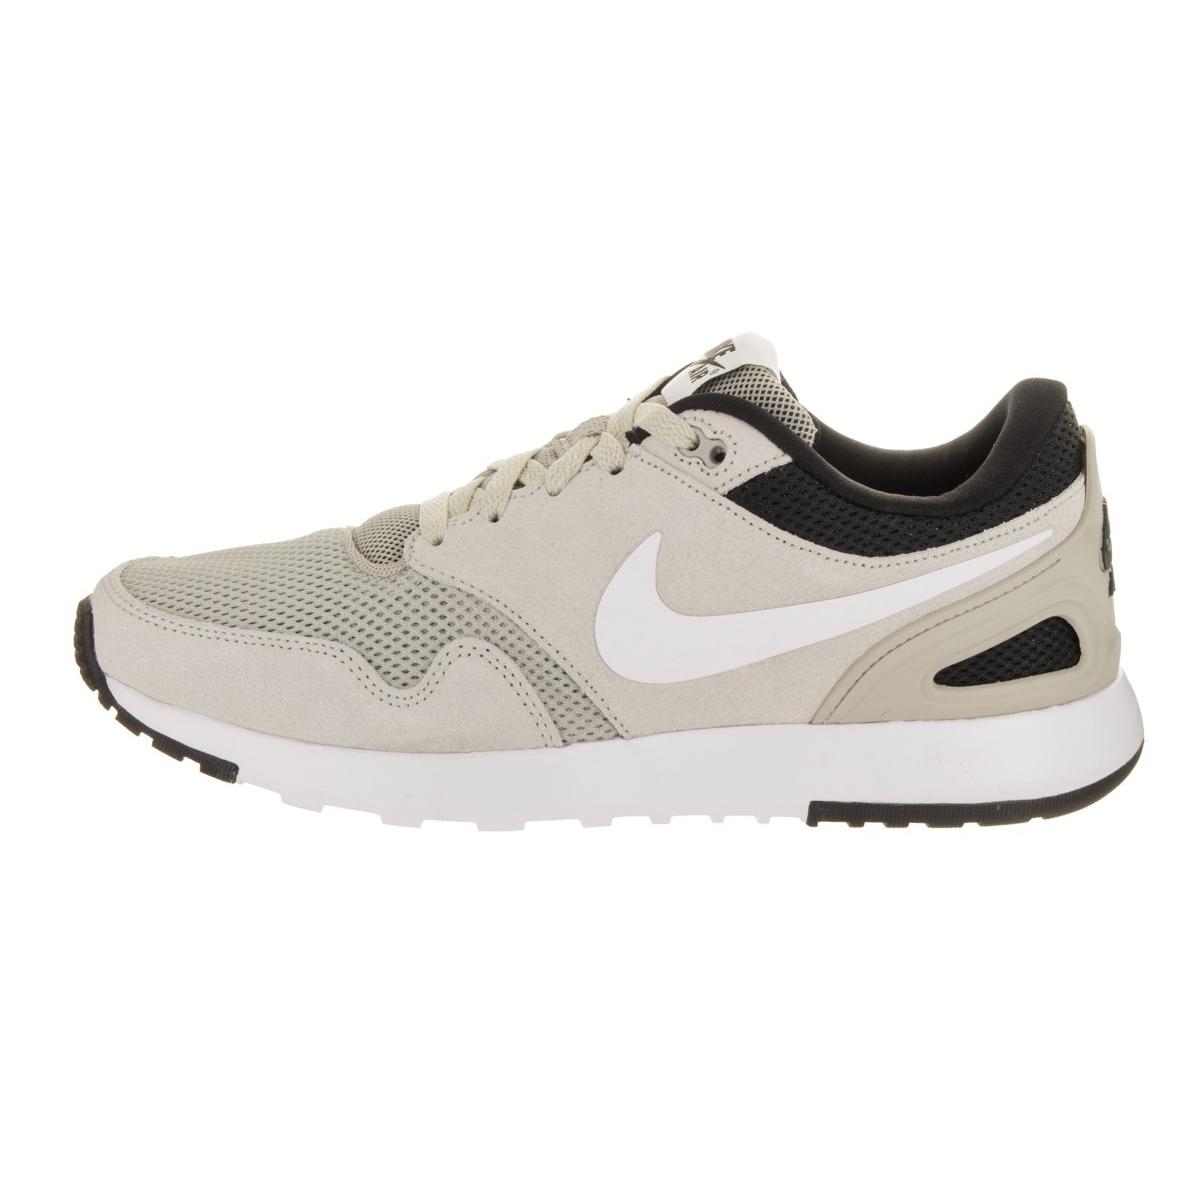 detailed look 8abe1 3b10d ... Sneakers · Scarpa Nike Air Vibenna Moda Uomo Beige. LOADING IMAGES